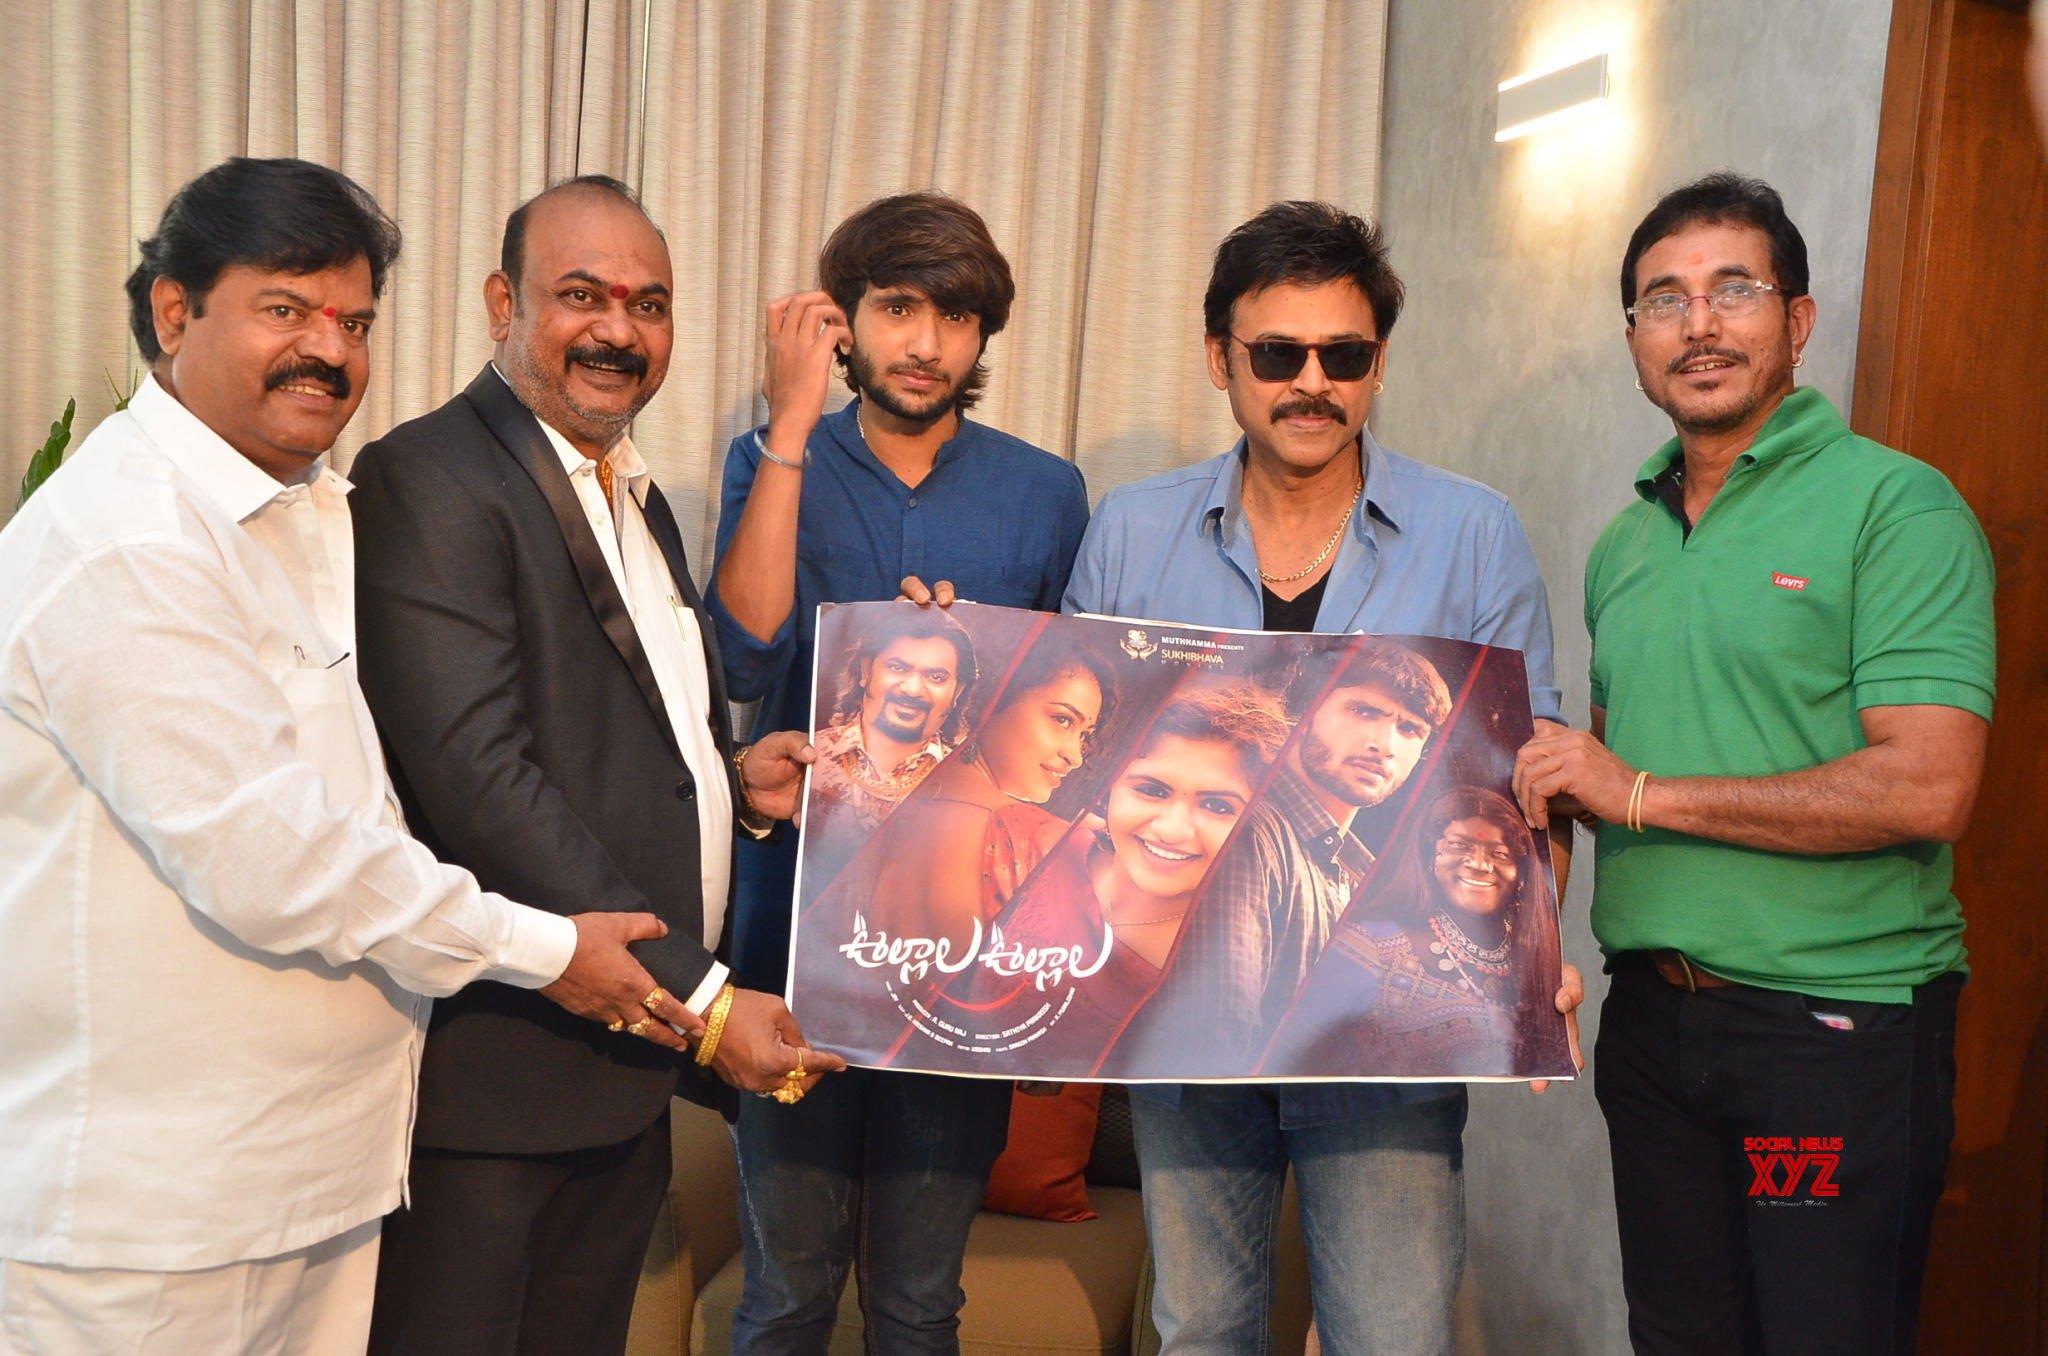 Venkatesh Launches Ullala Ullala Movie Teaser - Gallery